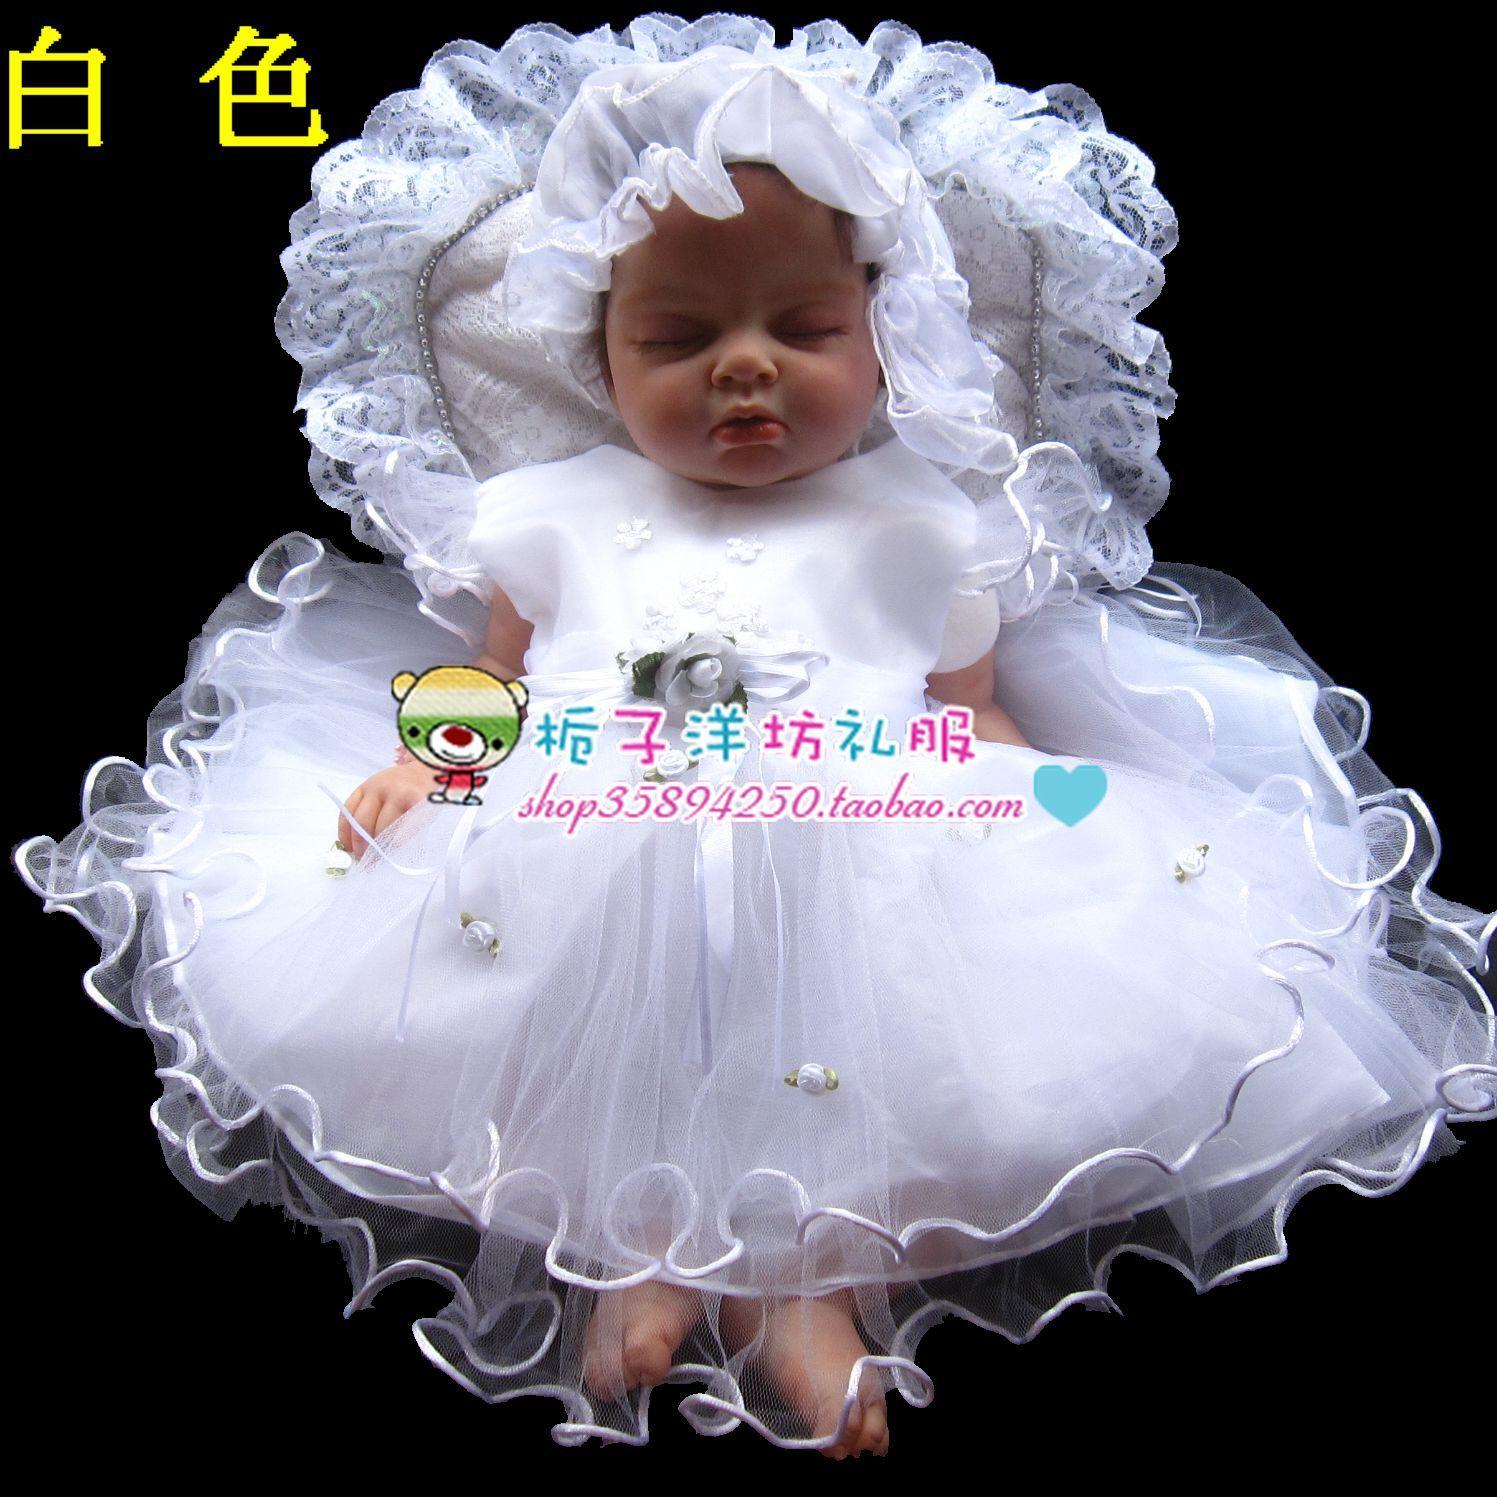 Dress baby princess dress female child one piece dress tulle dress